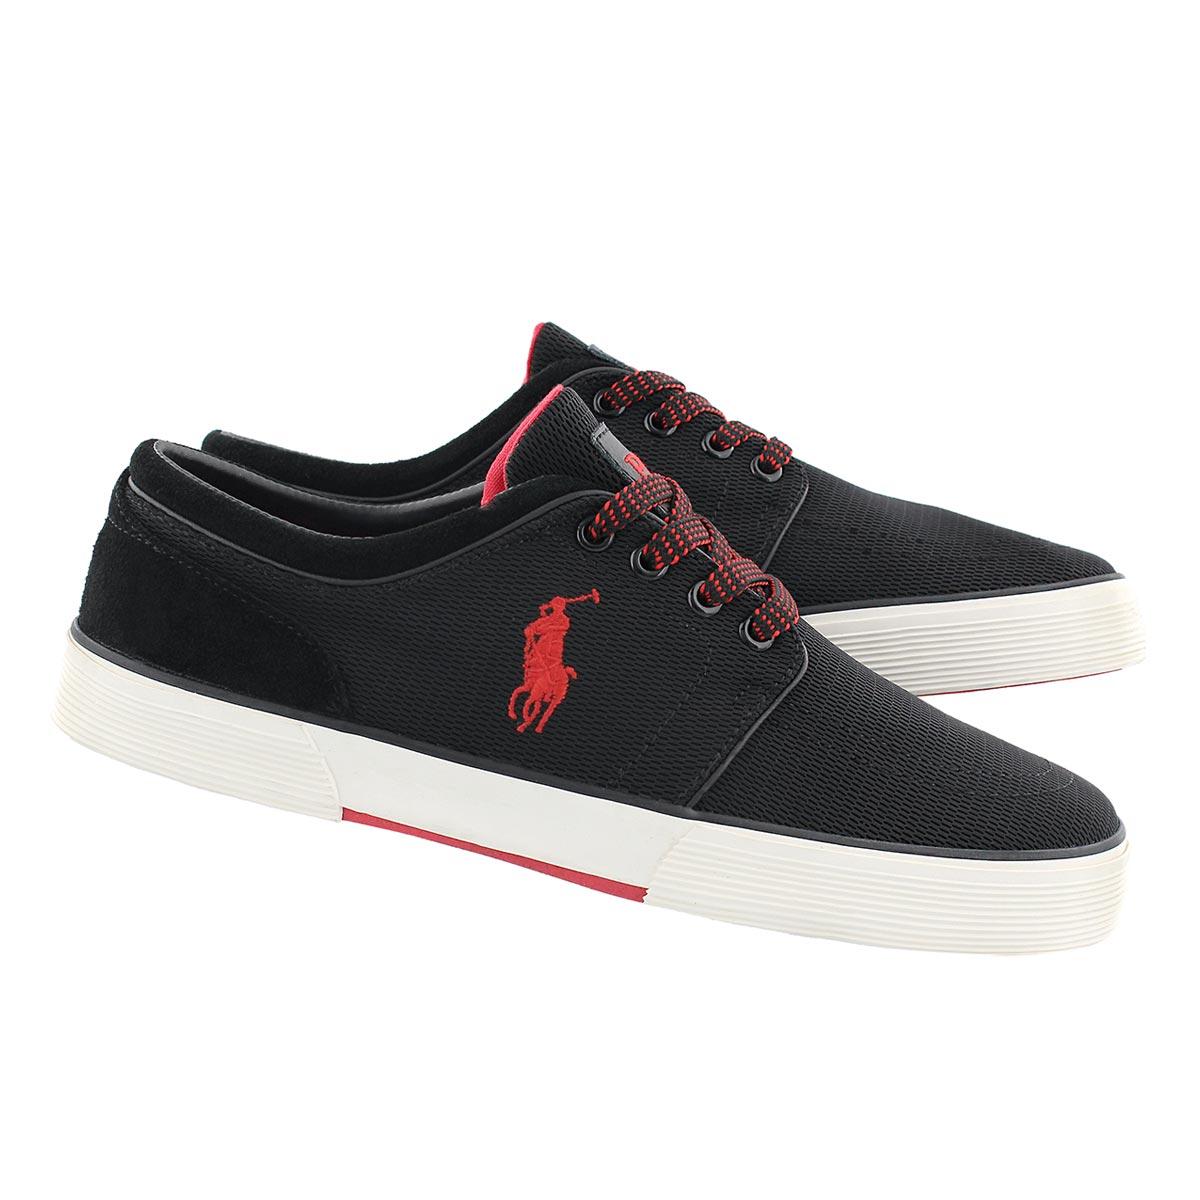 Mns Faxon Low black lace up sneaker